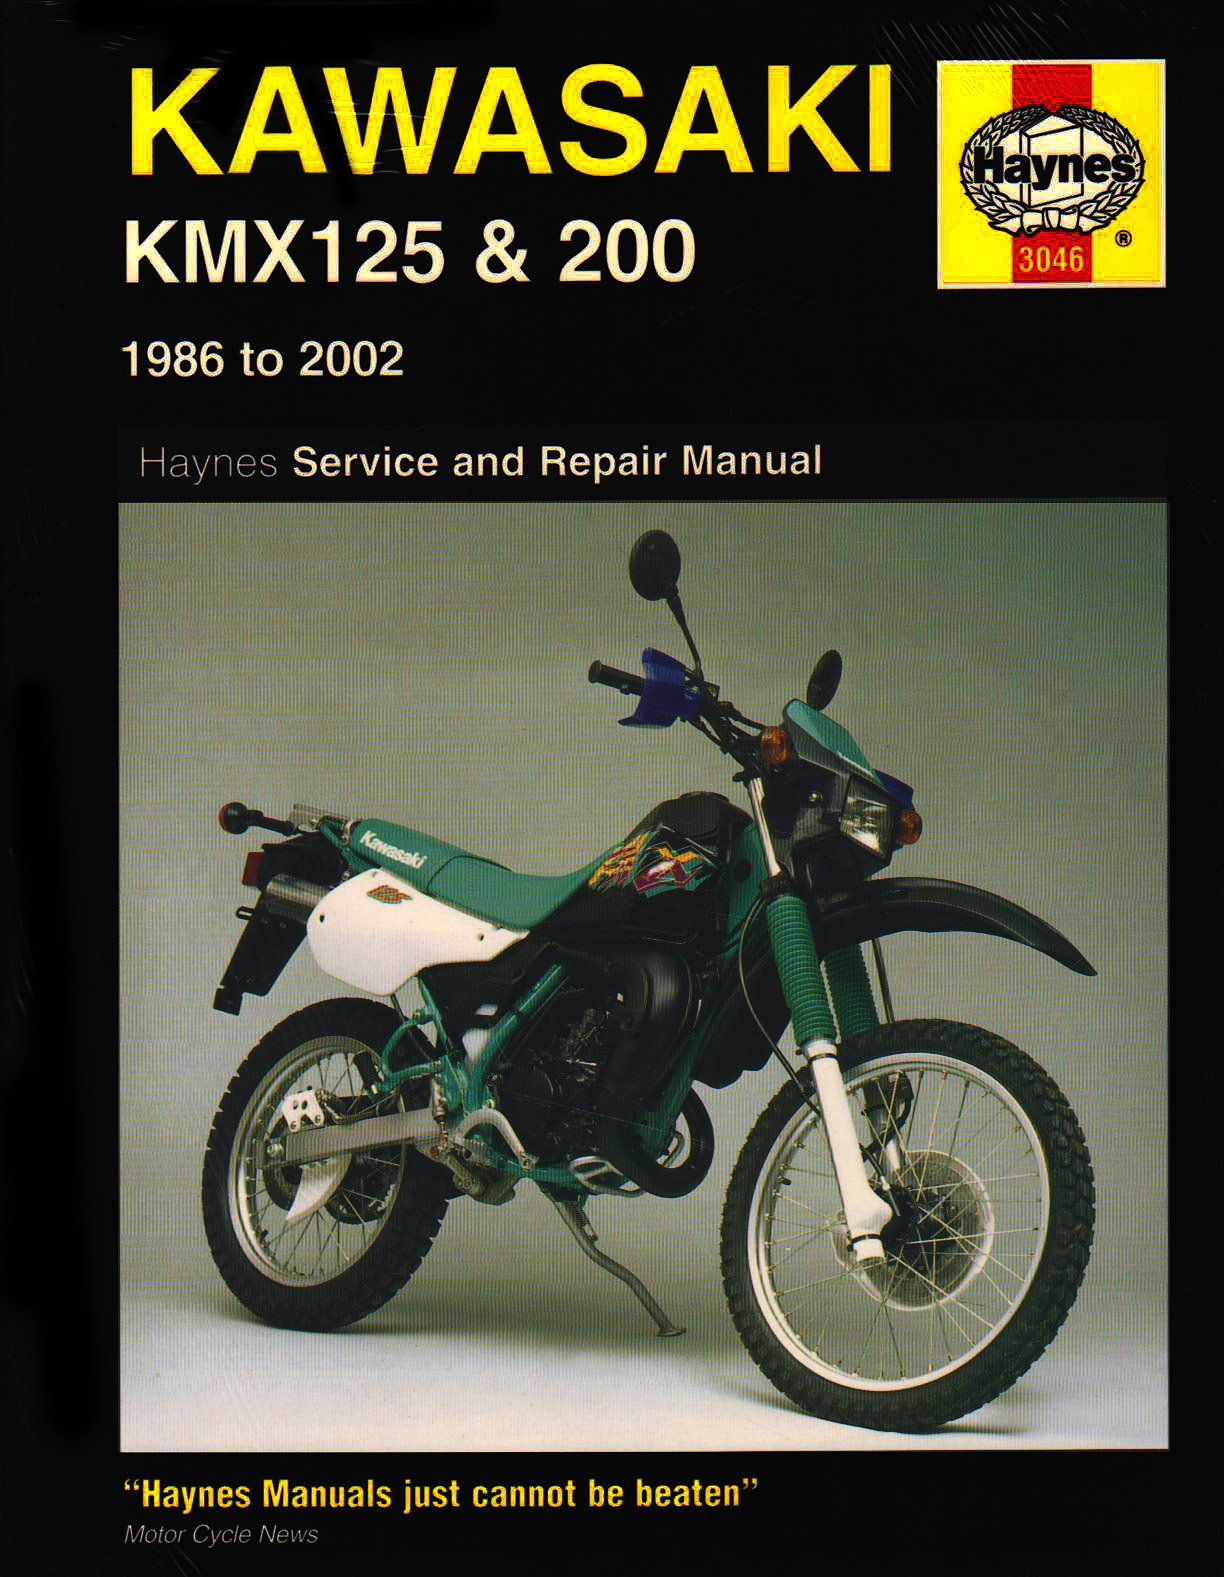 Kawasaki KMX 125 and 200 Service and Repair Manual: 1986-2002 (Haynes Owners  Workshop Manuals): Julian Ryder: 9781859609880: Amazon.com: Books